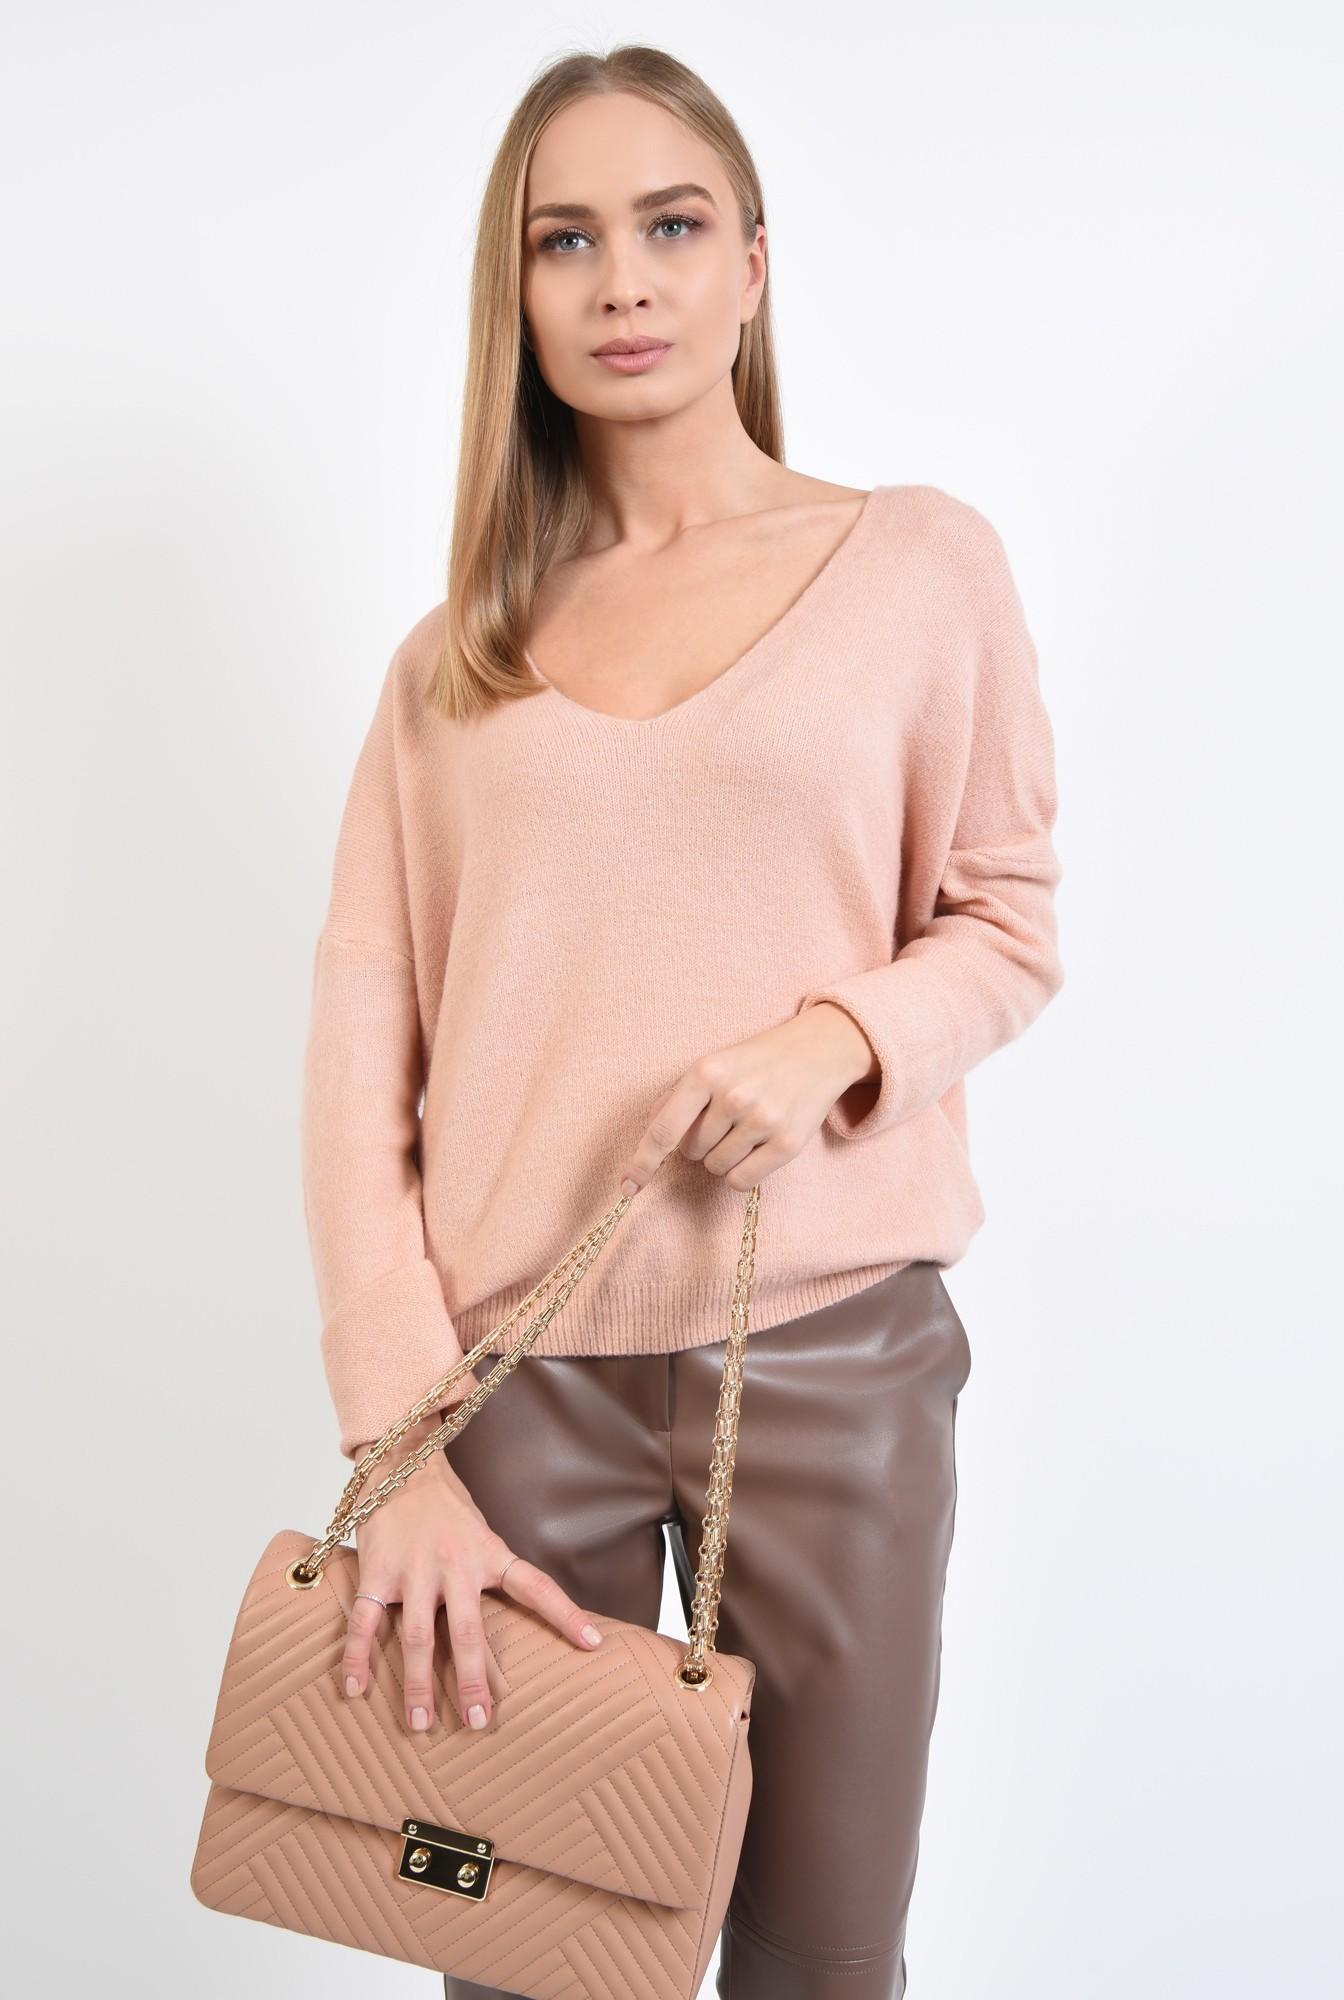 2 - 360 - pulover dama, online, tricotaje, roz, bordura reiata